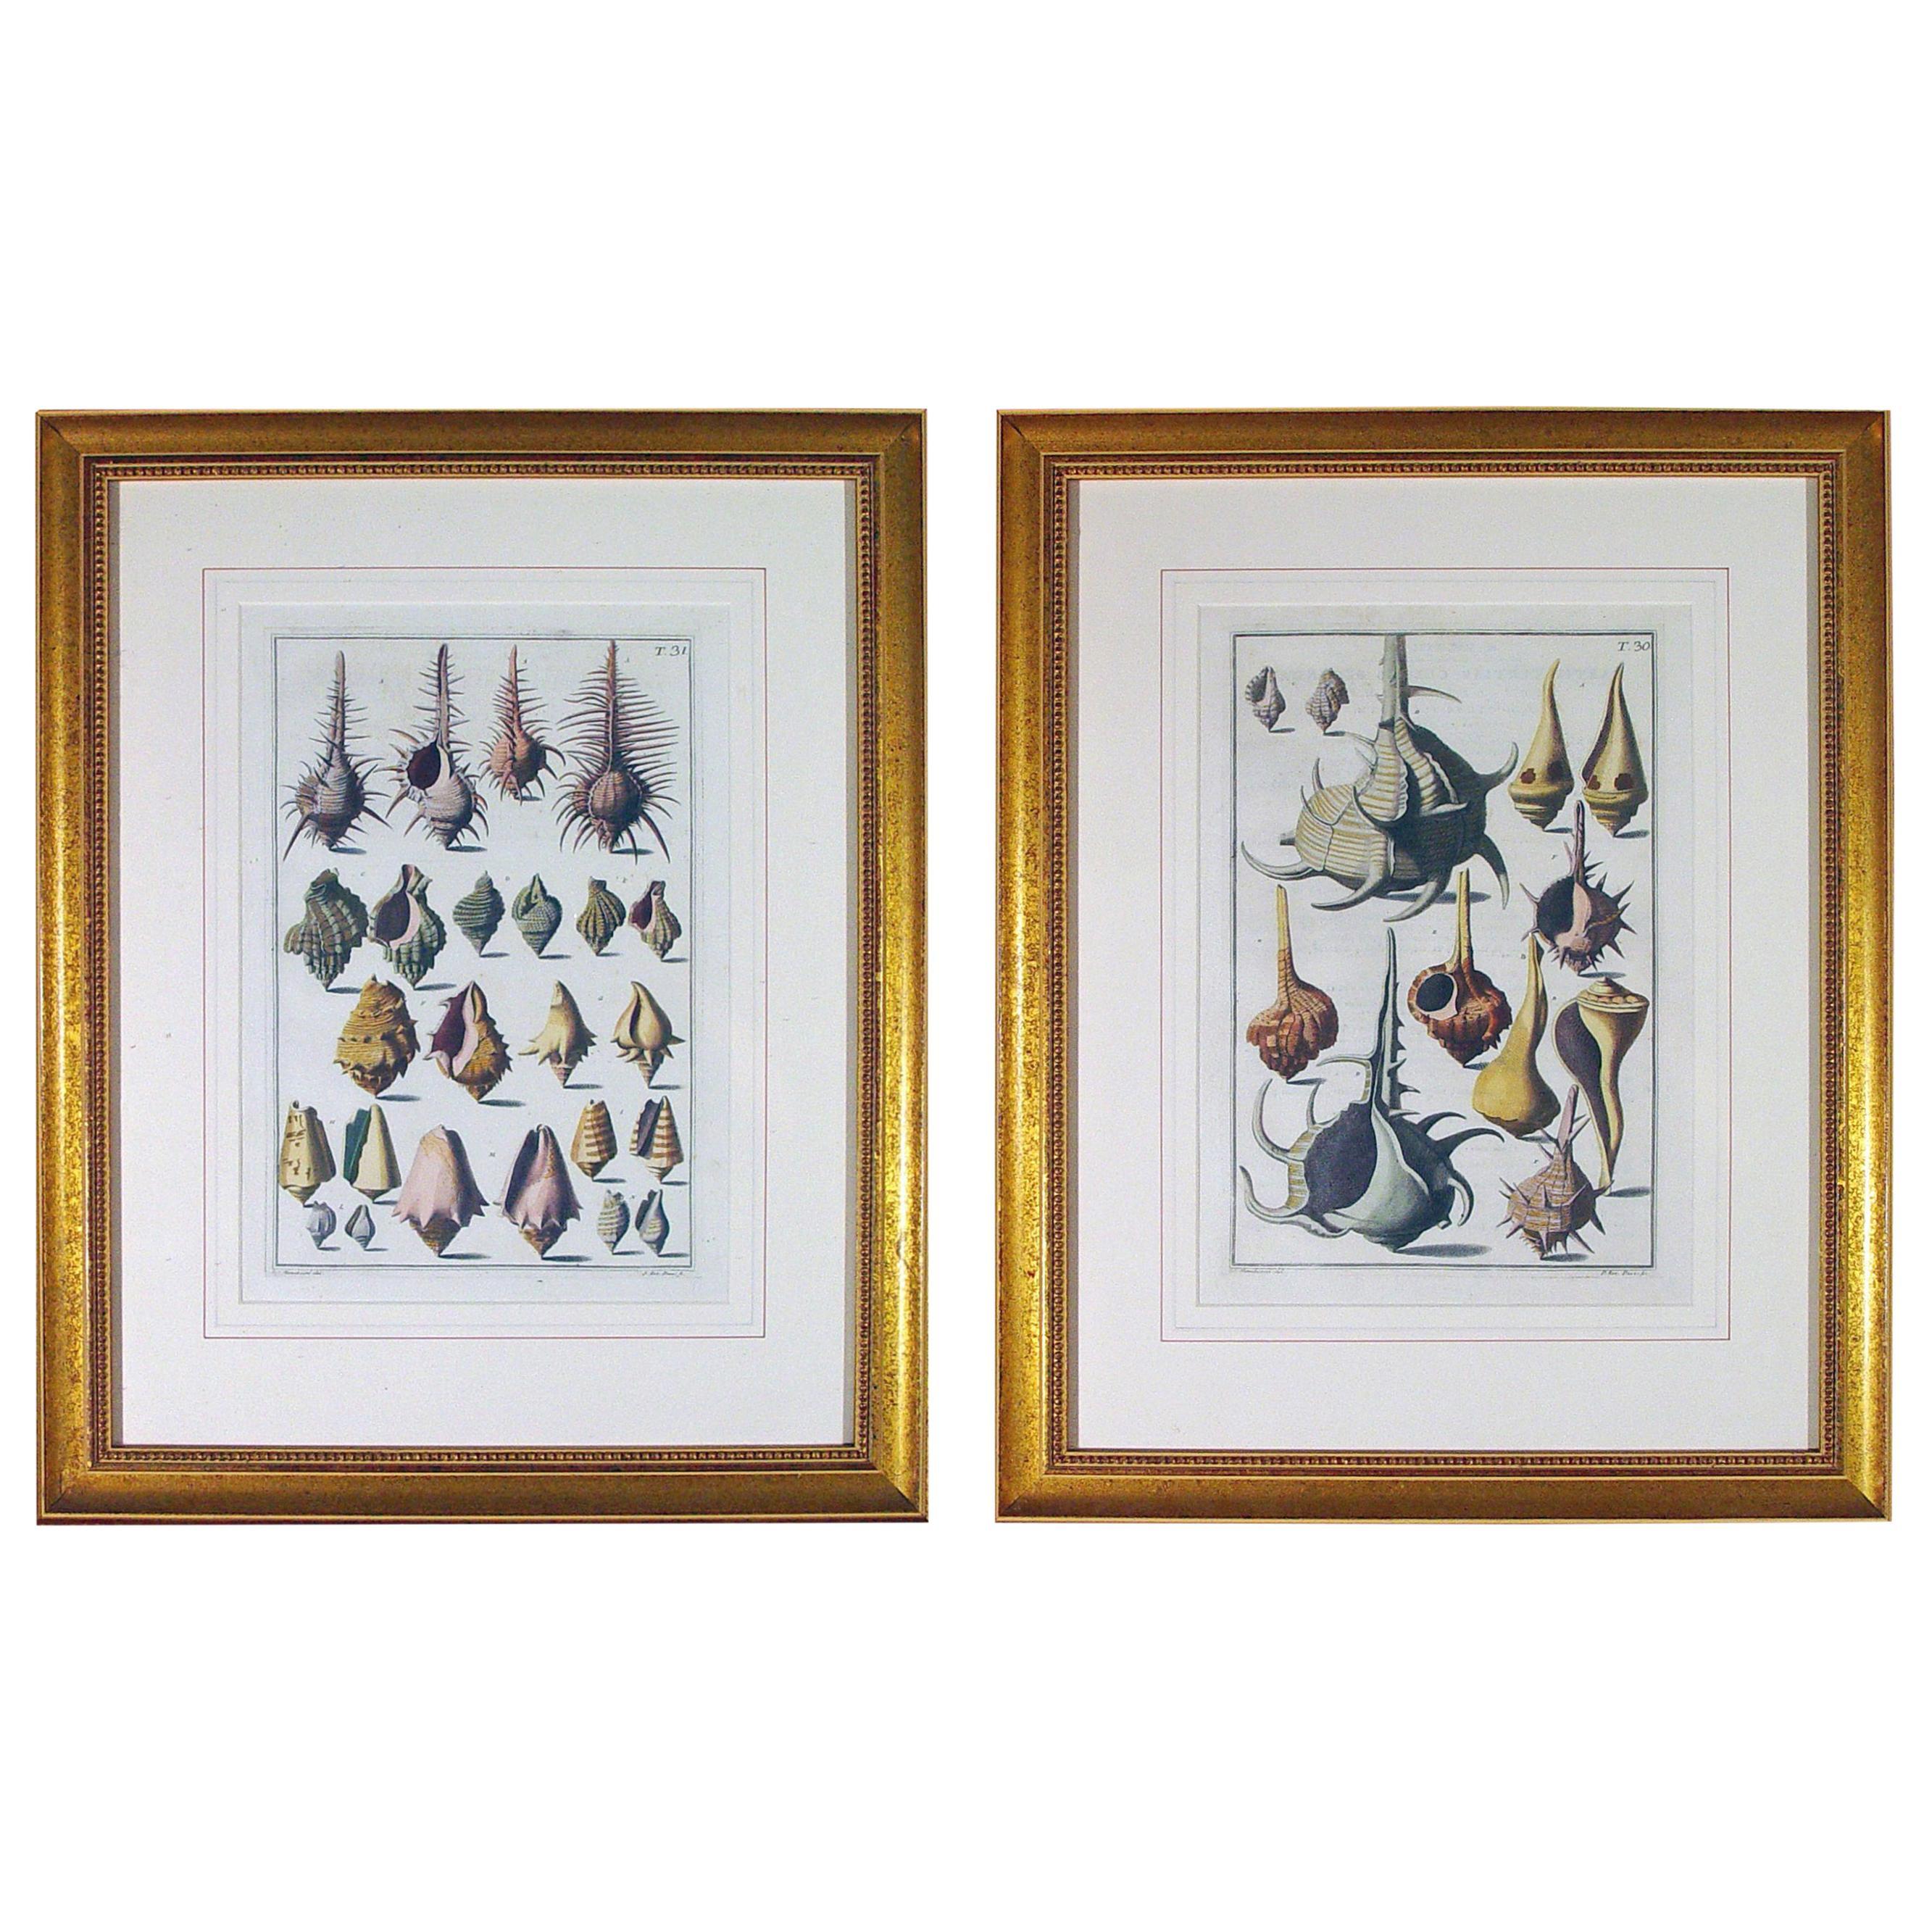 Niccolò Gualtieri Pair of Framed Copperplate Engravings of Sea Shells